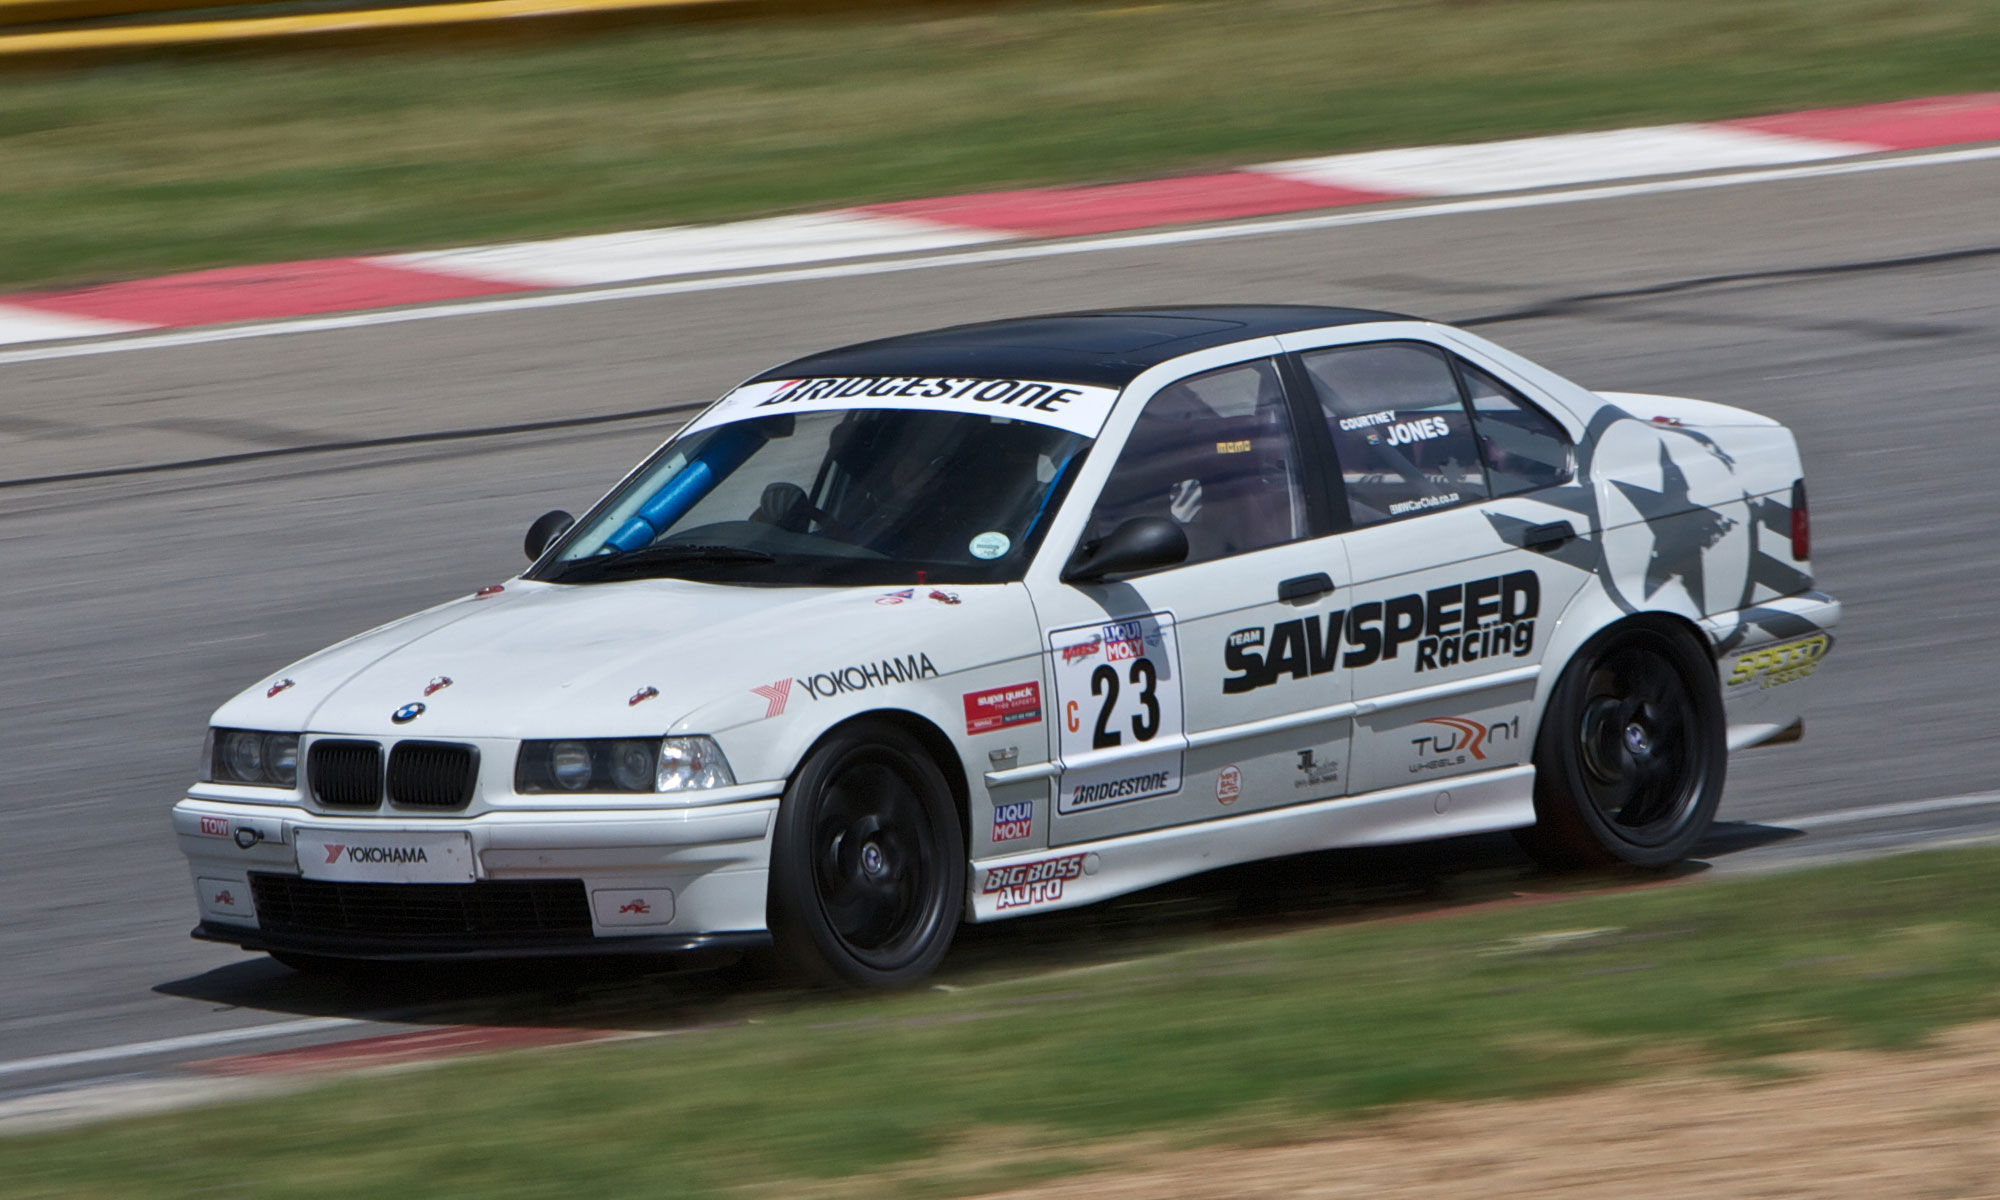 BMW E36 328i racecar